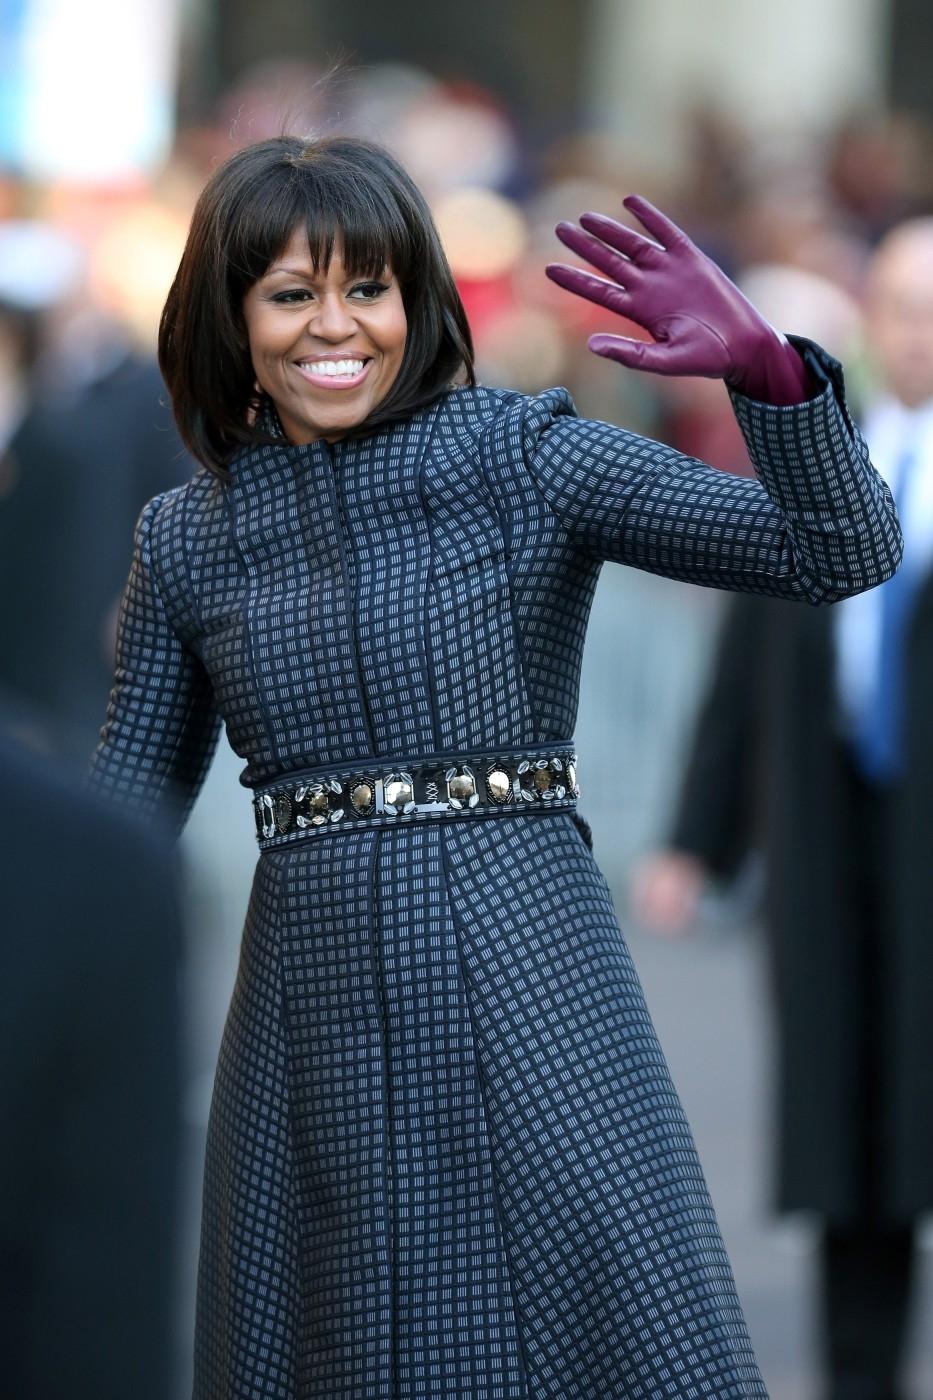 President Obama Inaugural Parade in Washington